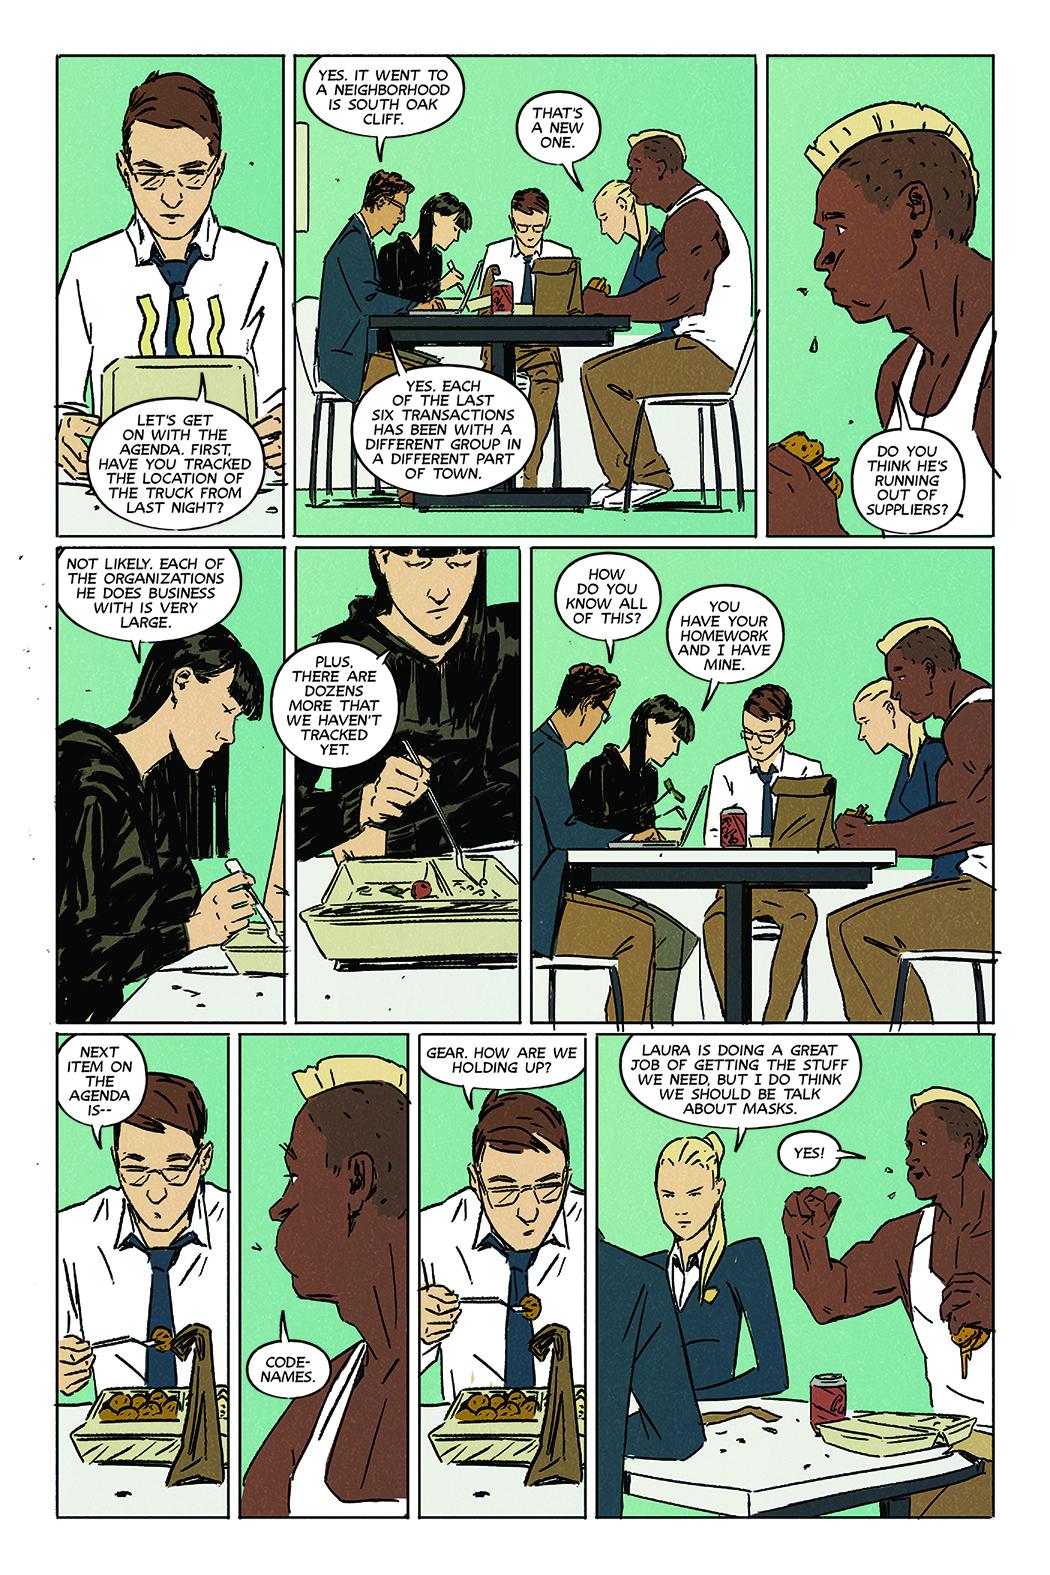 NIGHT OWL SOCIETY #2 PAGE 13 IDW